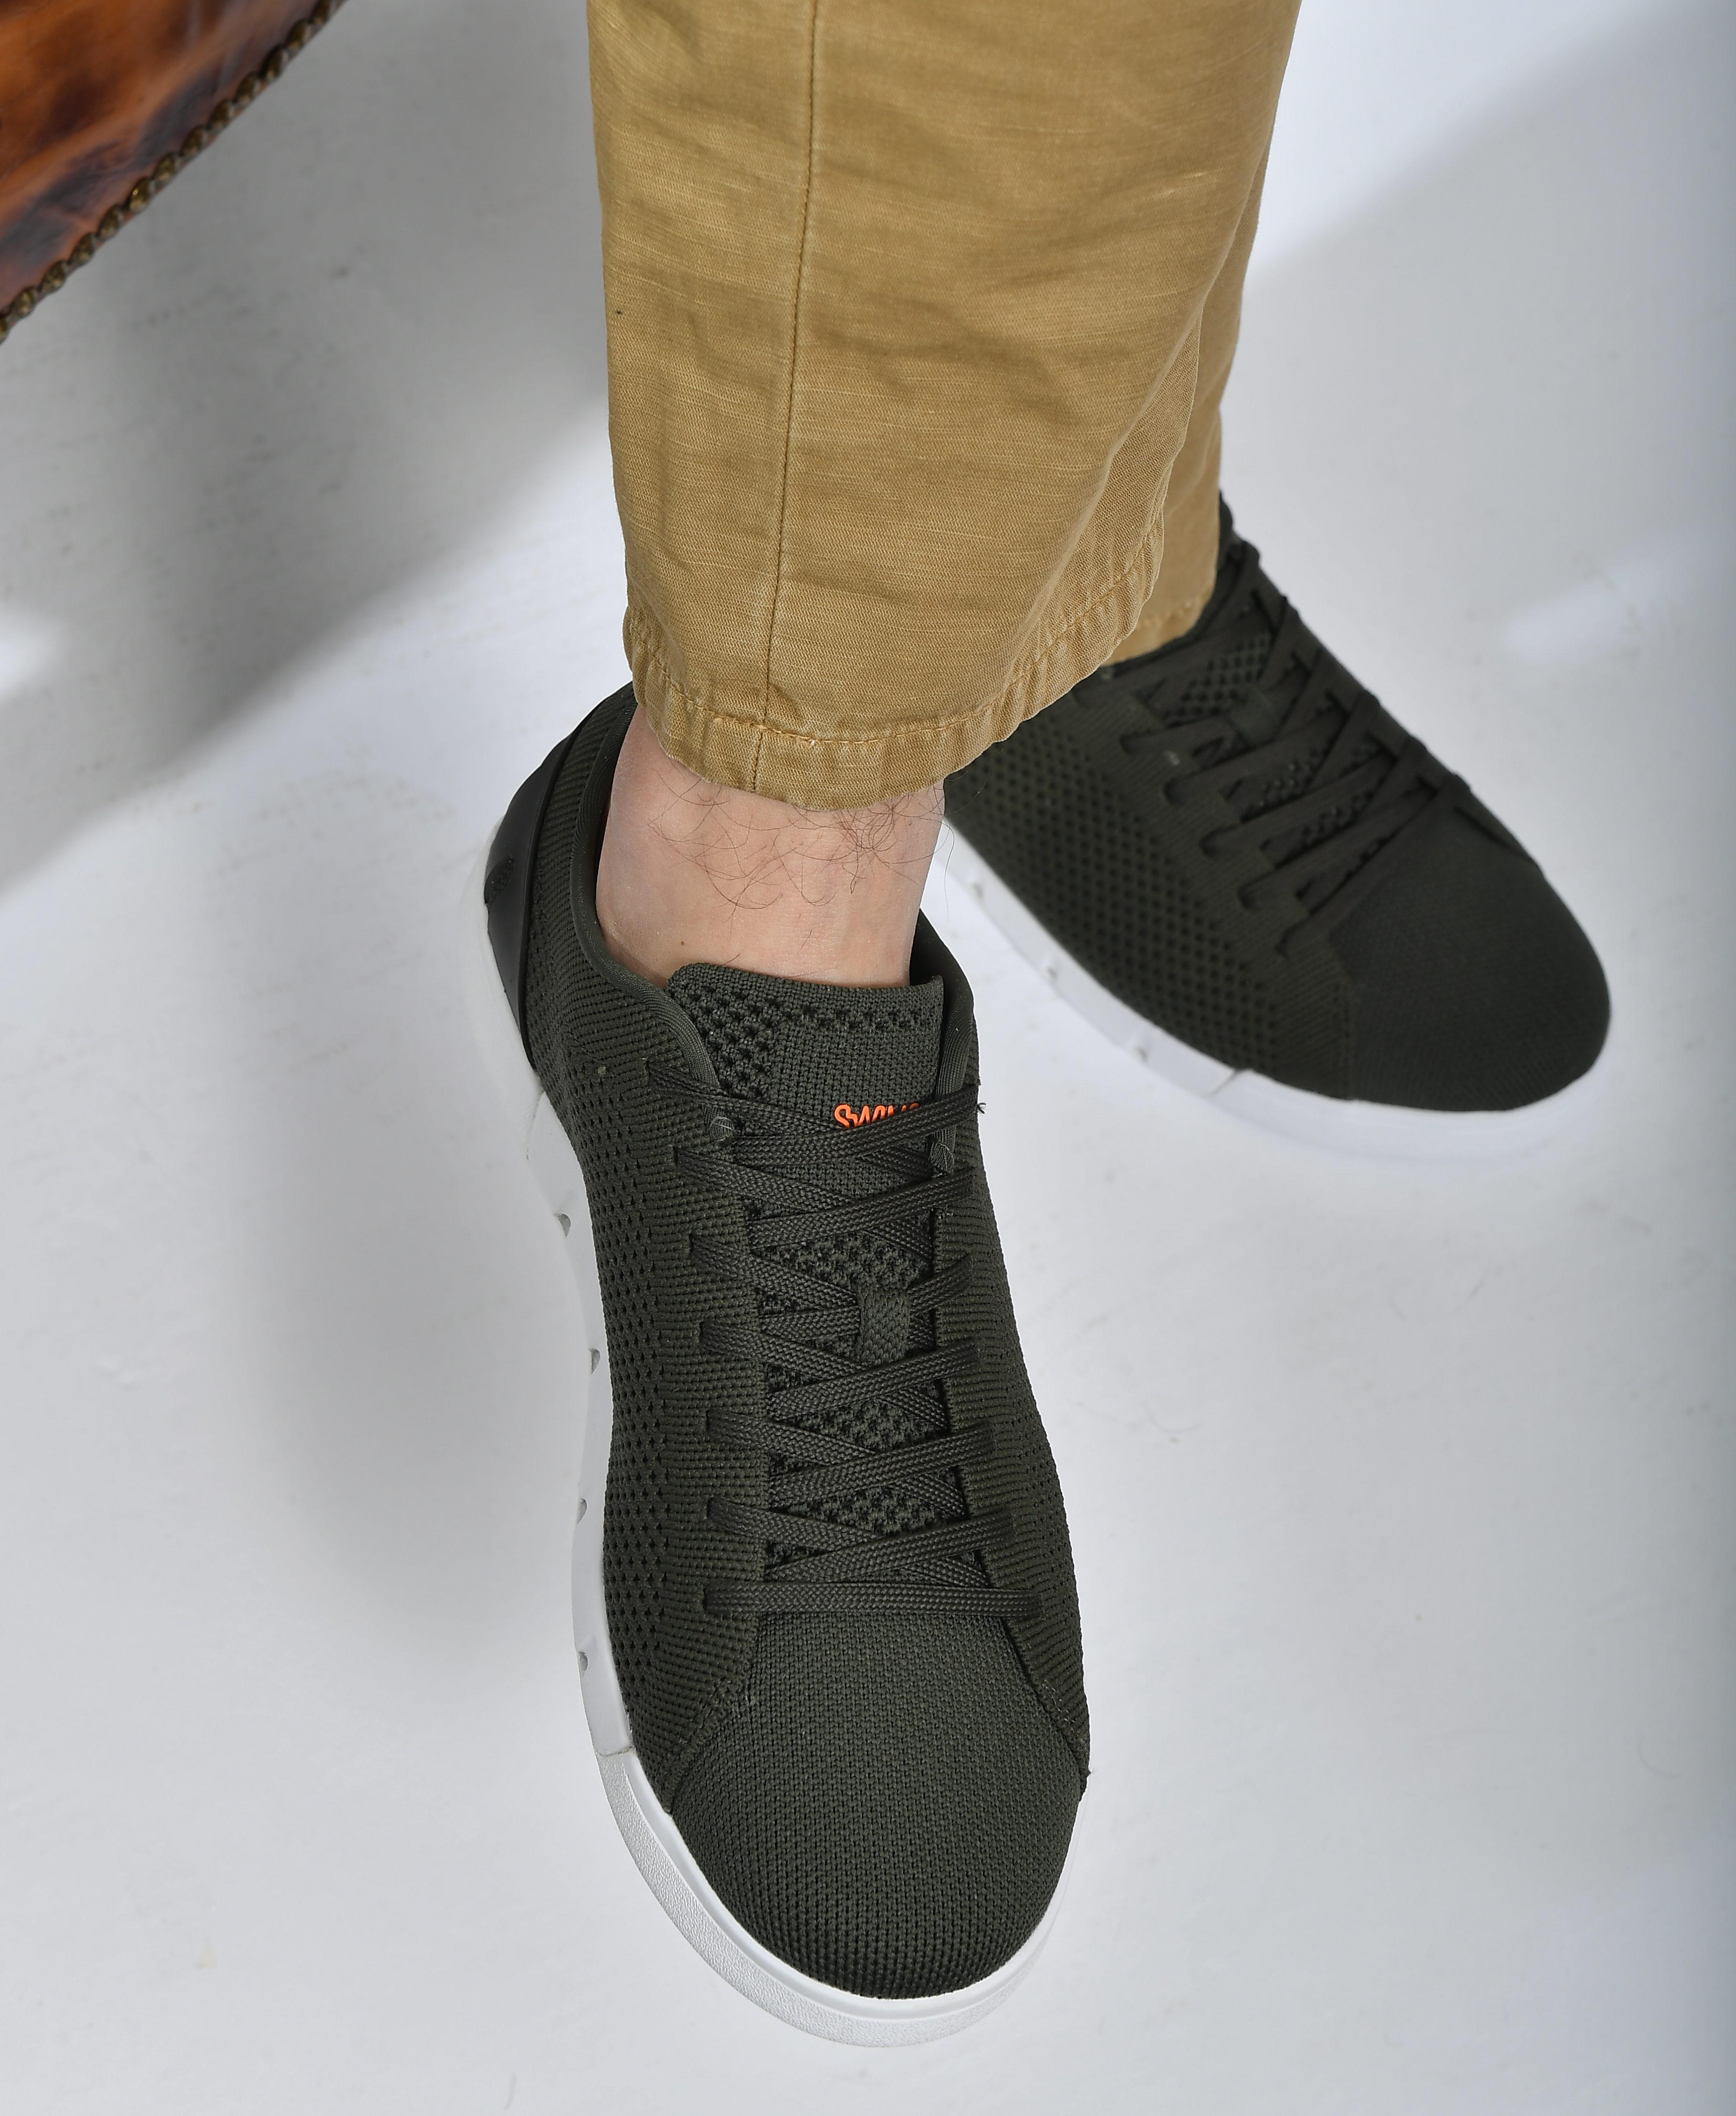 sneaker with ghost socks